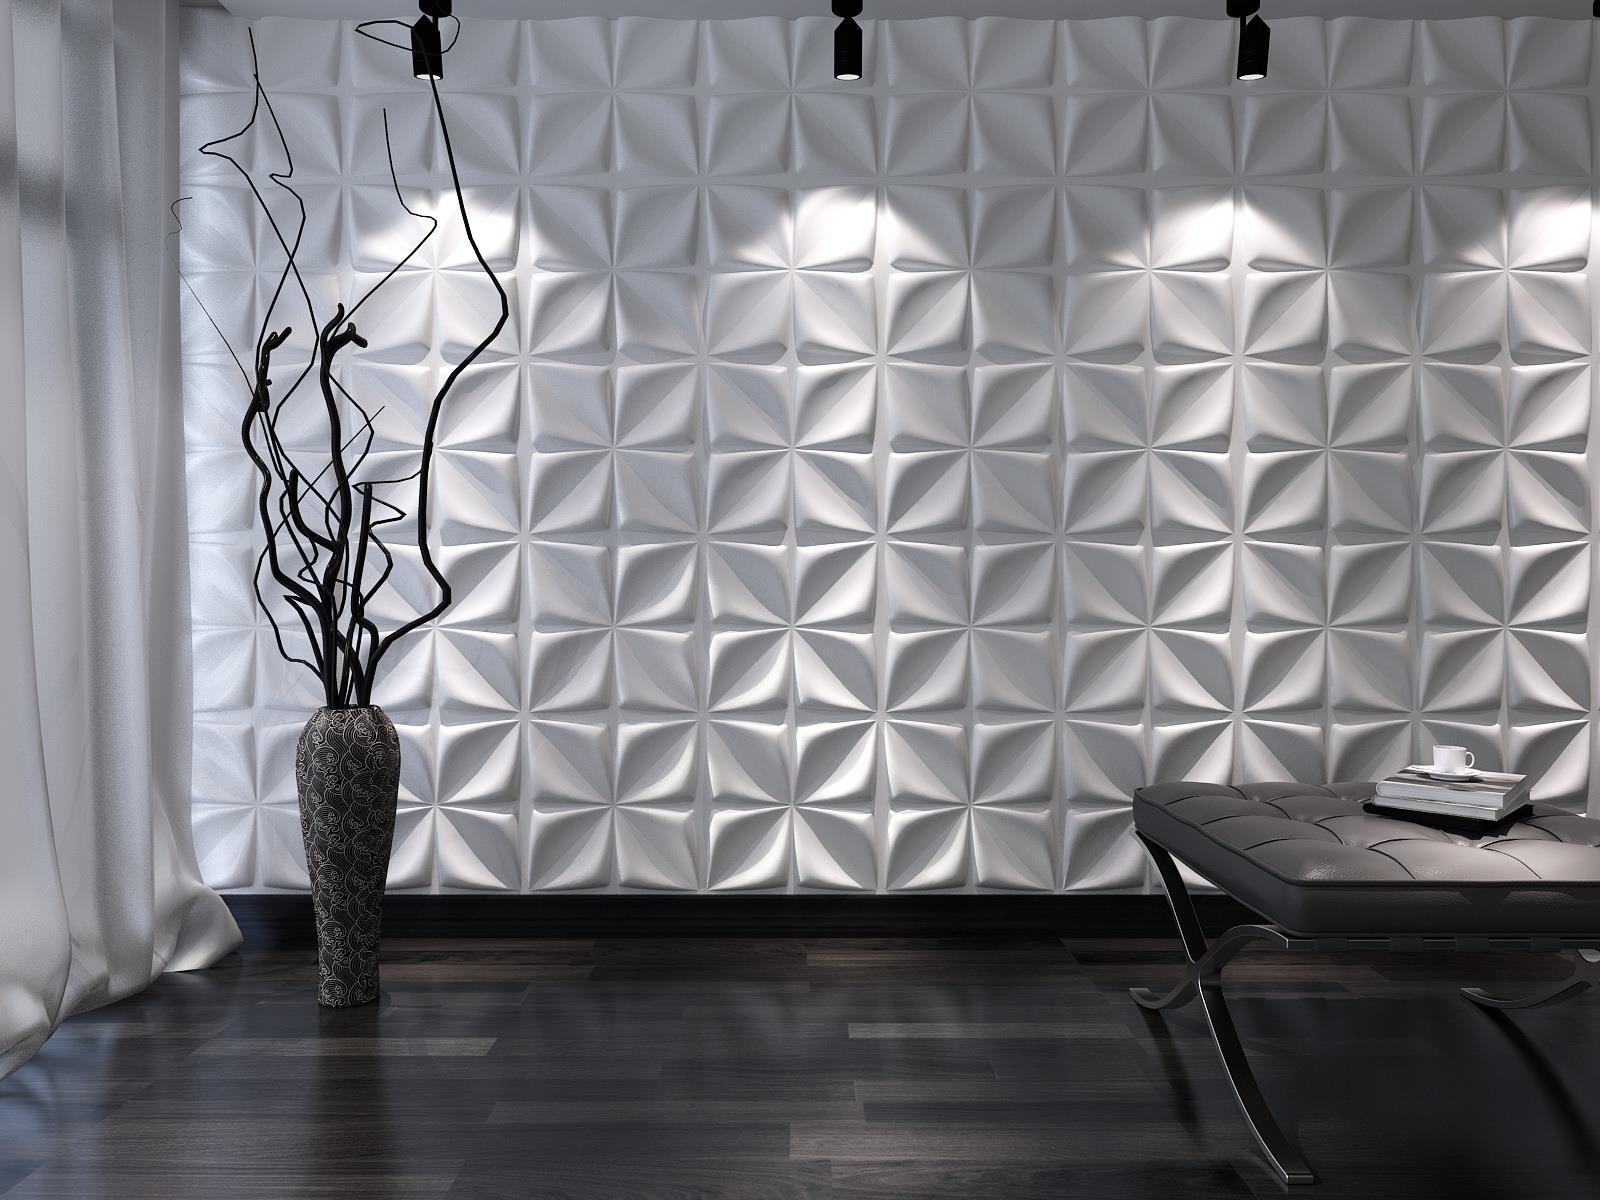 3D Wall Decor Panels Uk. . Wallface Motion Two Wall Panel Wall inside White 3D Wall Art